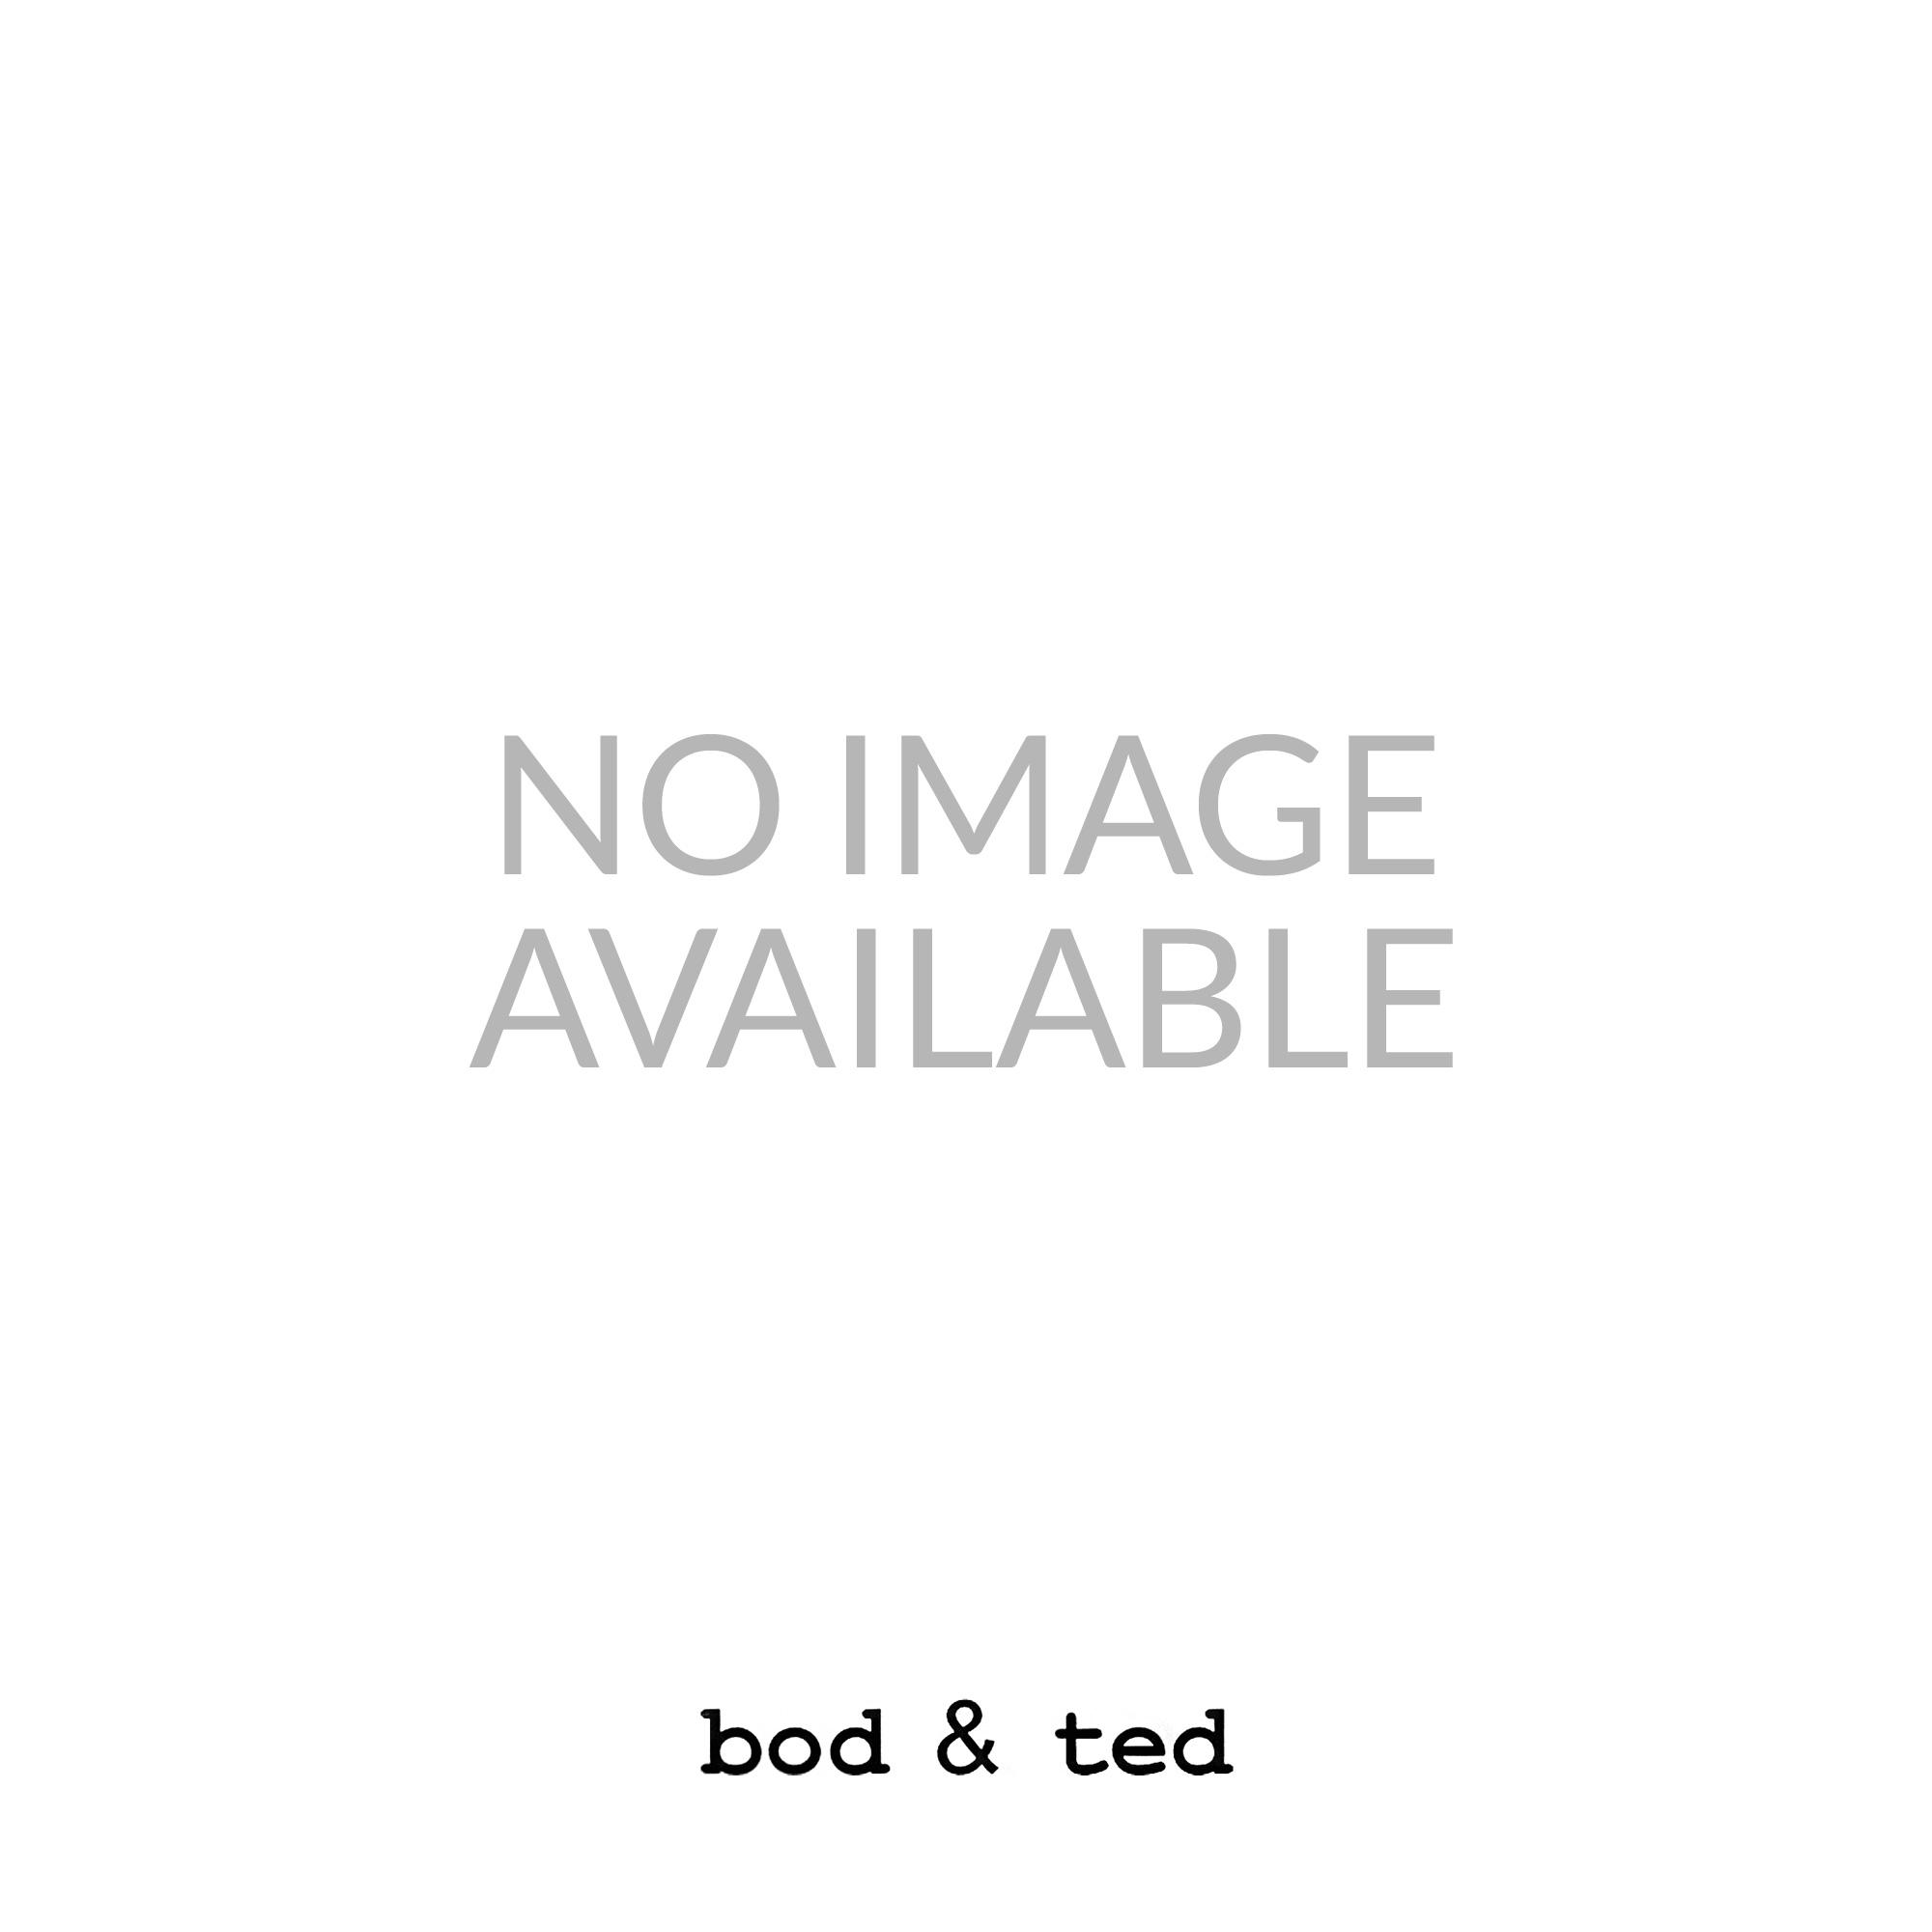 LEMPI (LEM-PE) Candle